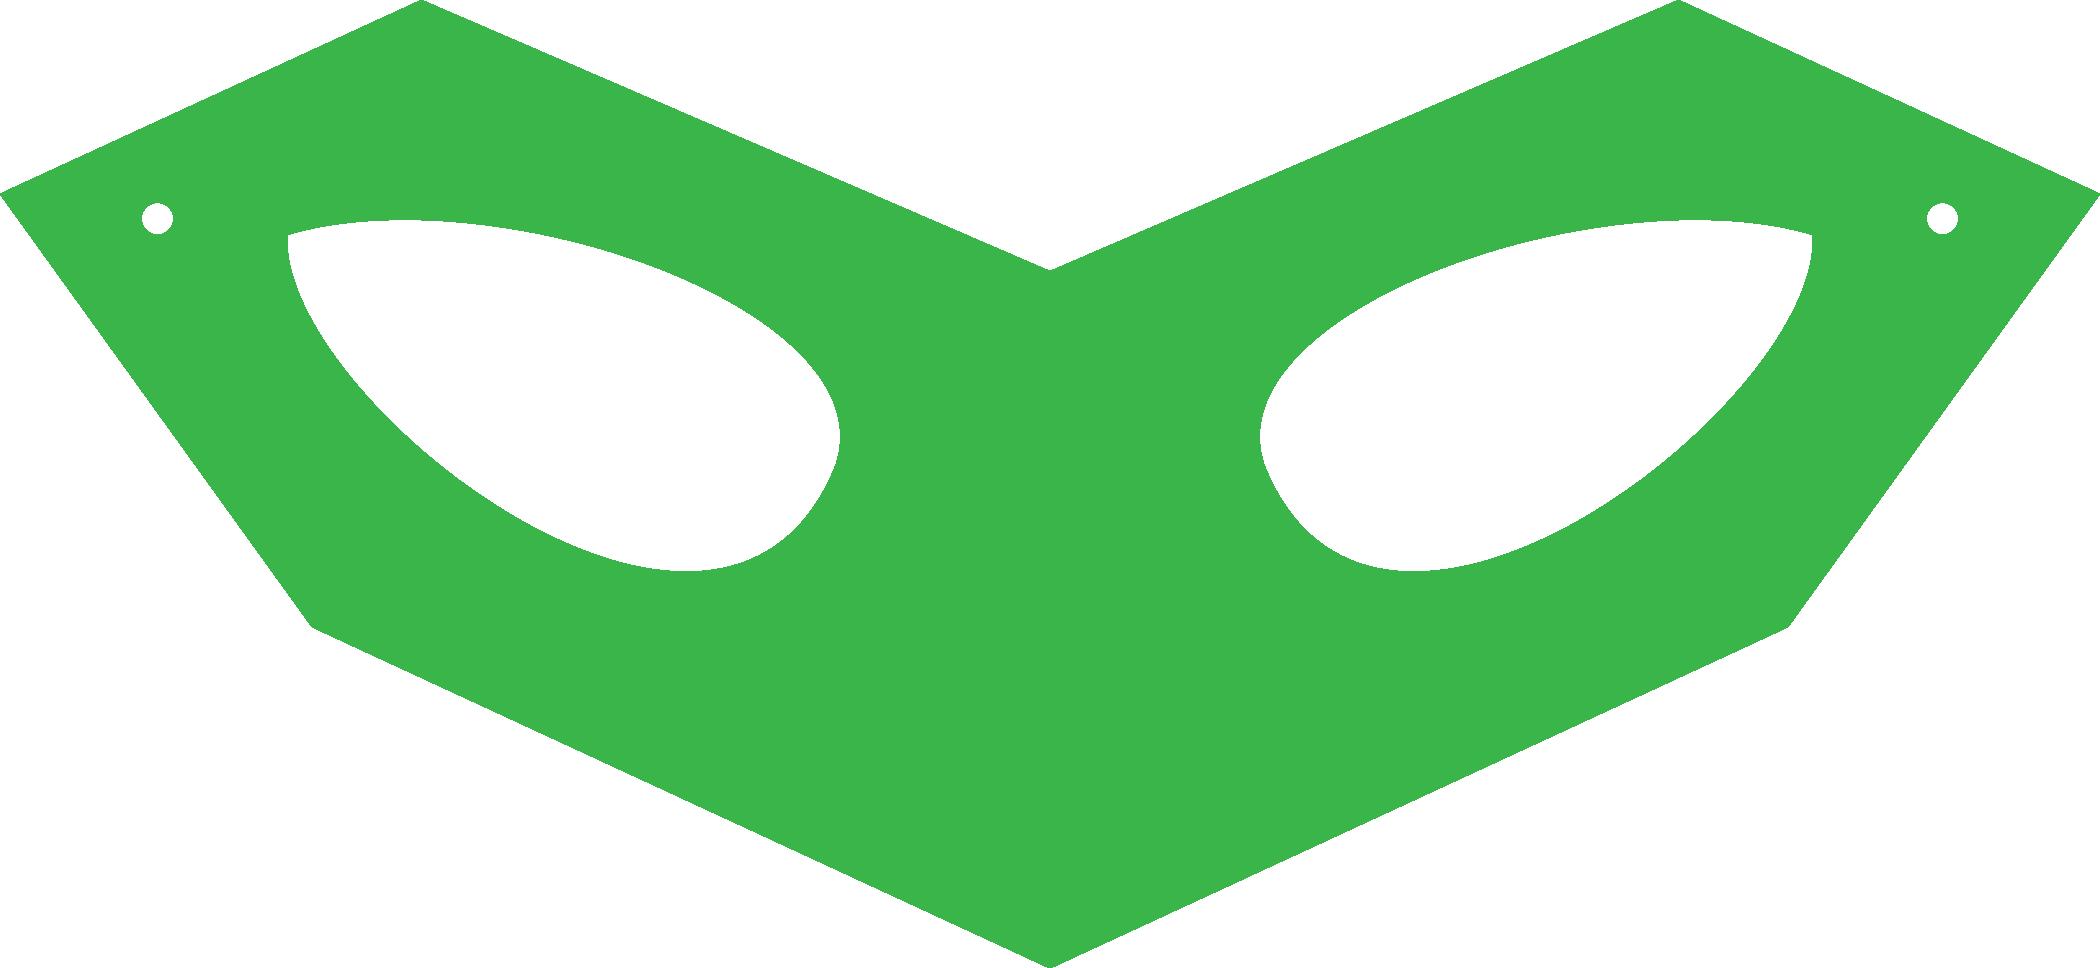 Printable Halloween Masks Printable Halloween Masks Halloween Masks Green Lantern Mask